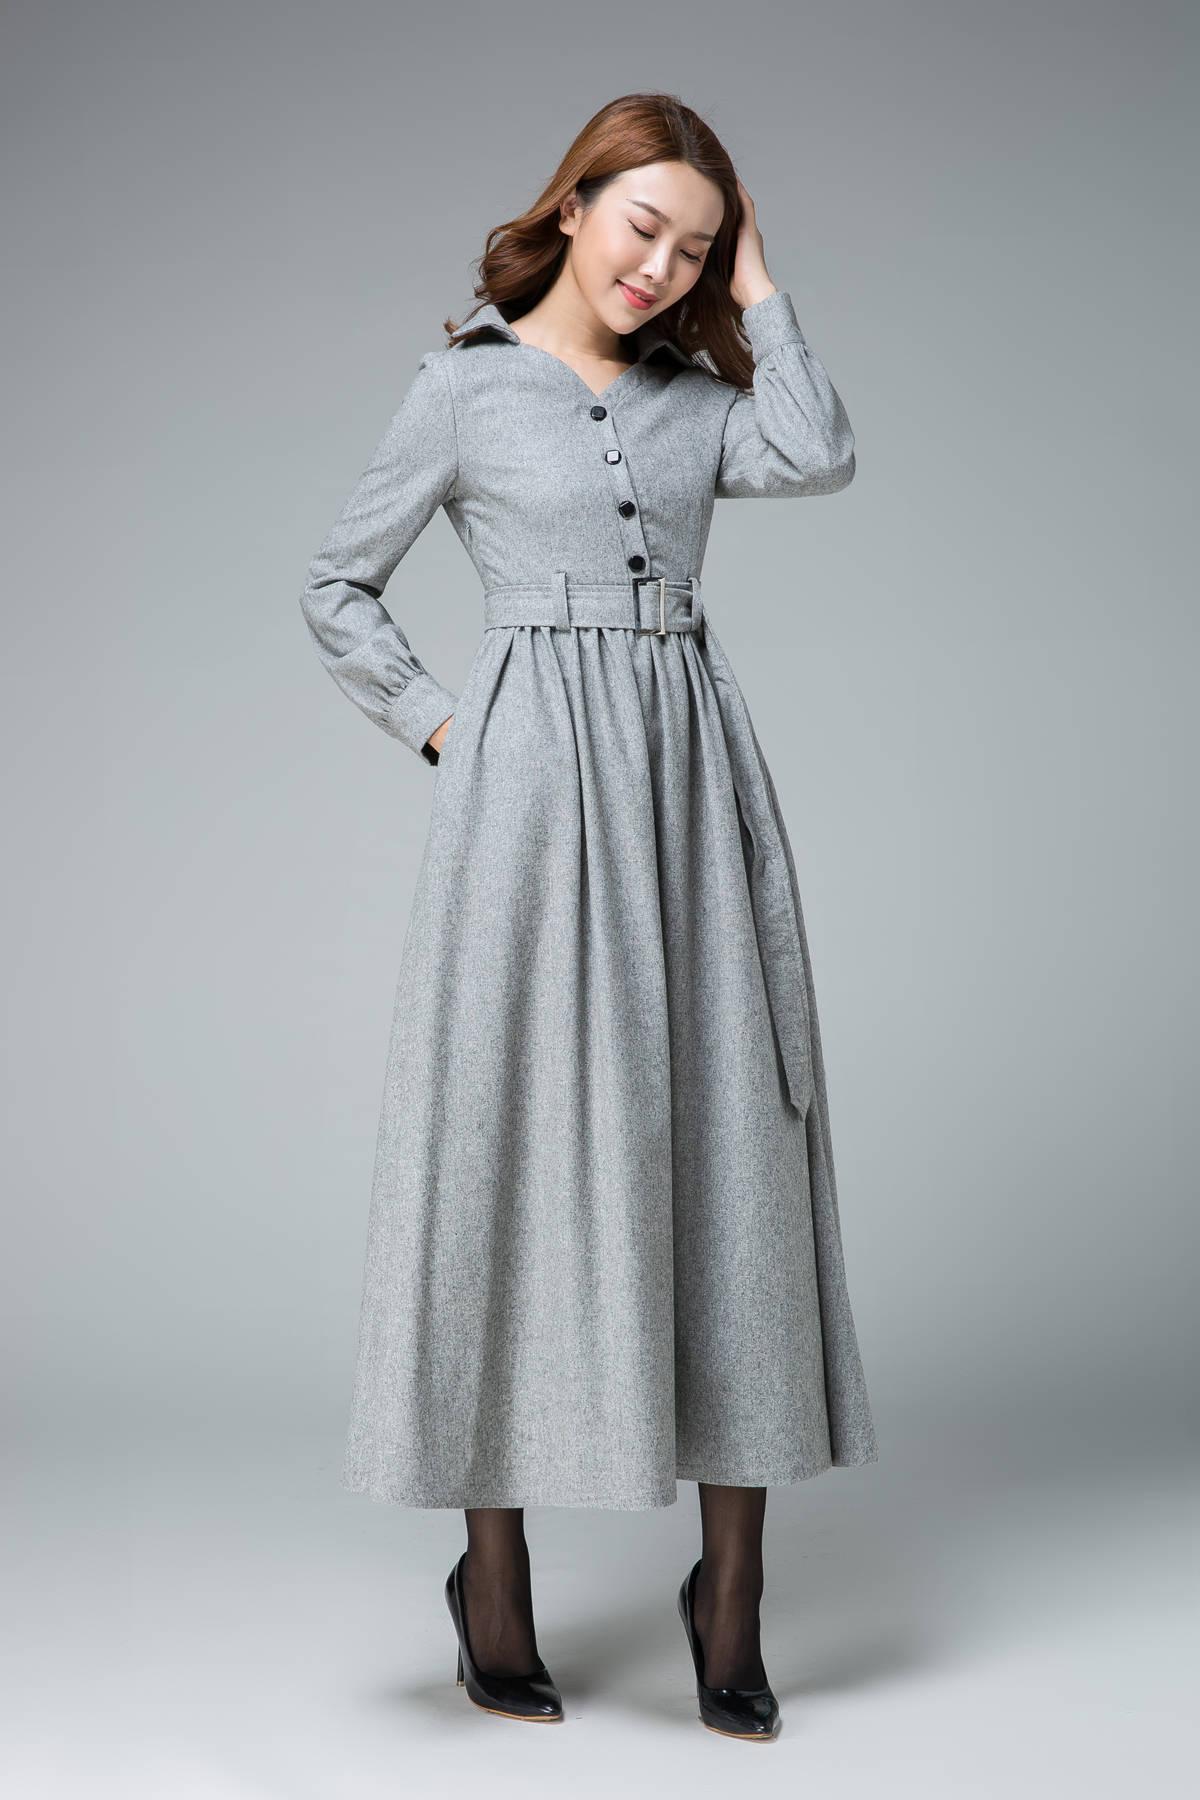 Shirt Dress Wool Dress Winter Dress Maxi Dress Pleated Etsy